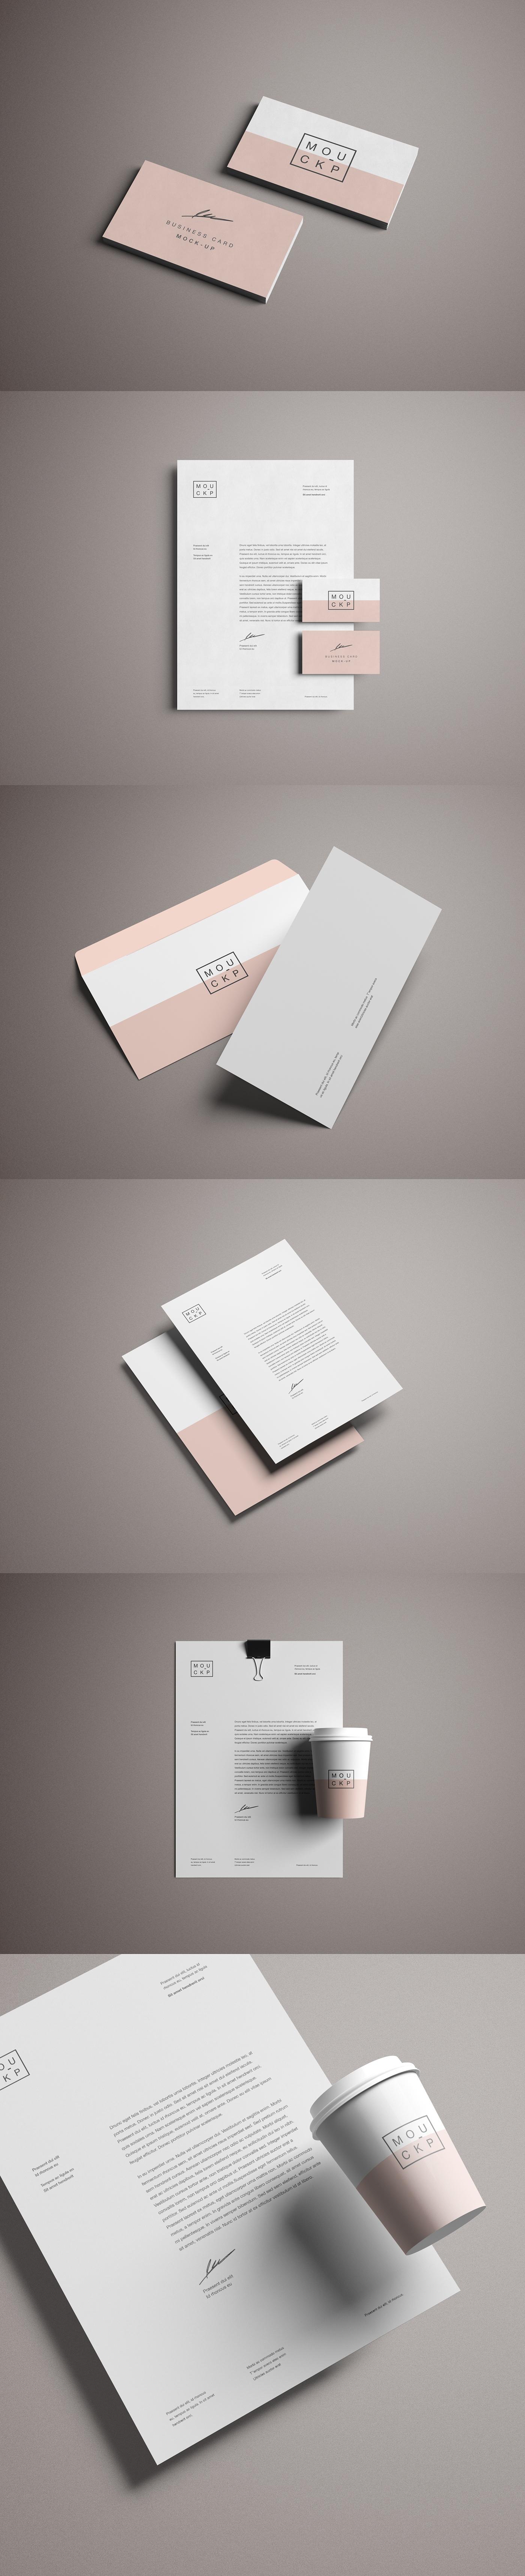 Stationery brand identity design inspiration art business card modern elegant premium free